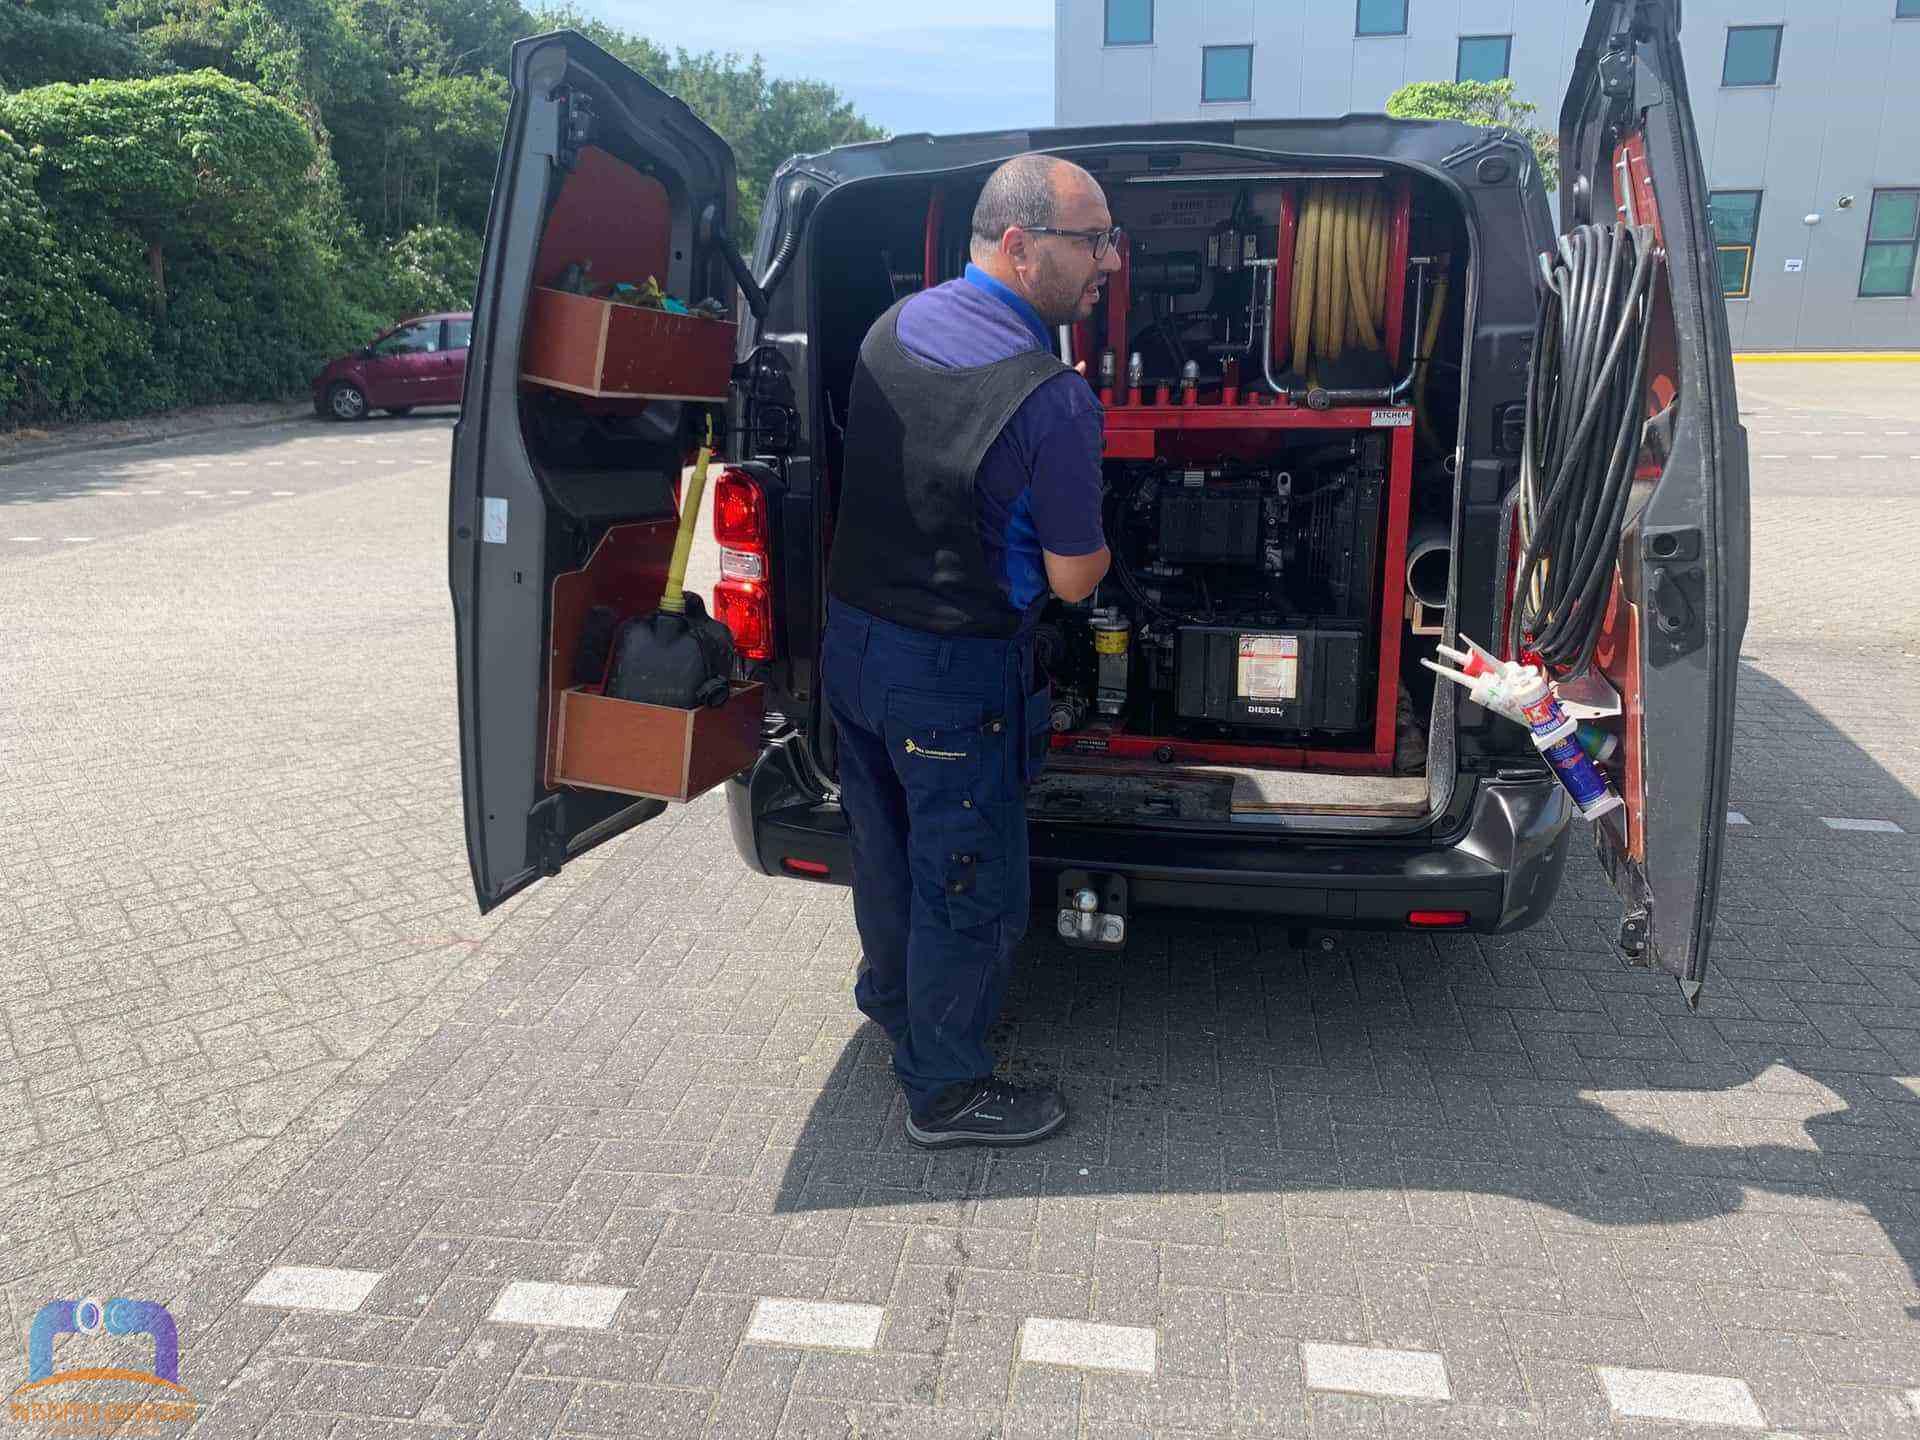 Loodgieter Amersfoort Ontstopping